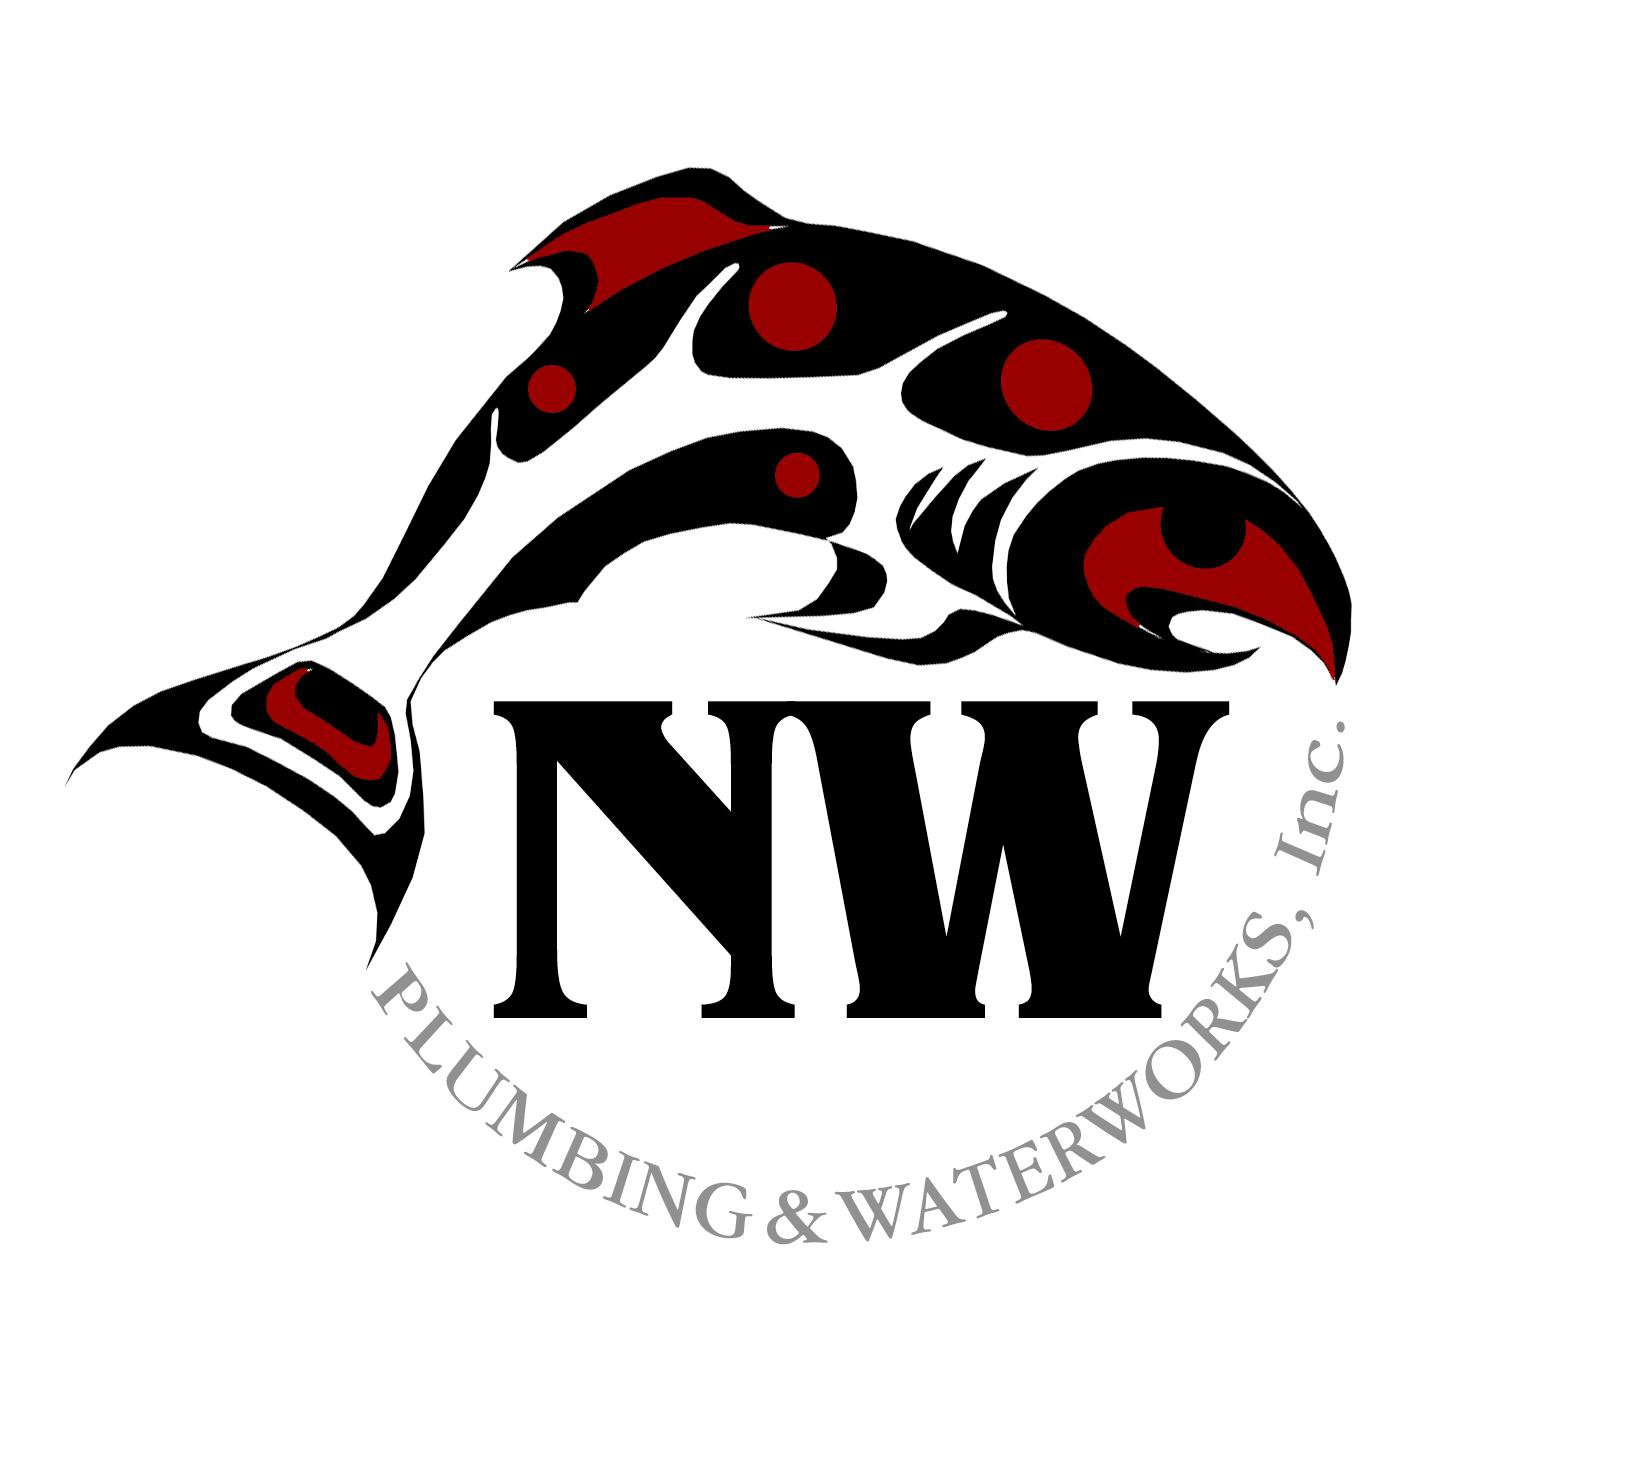 Northwest Plumbing and Waterworks Logo